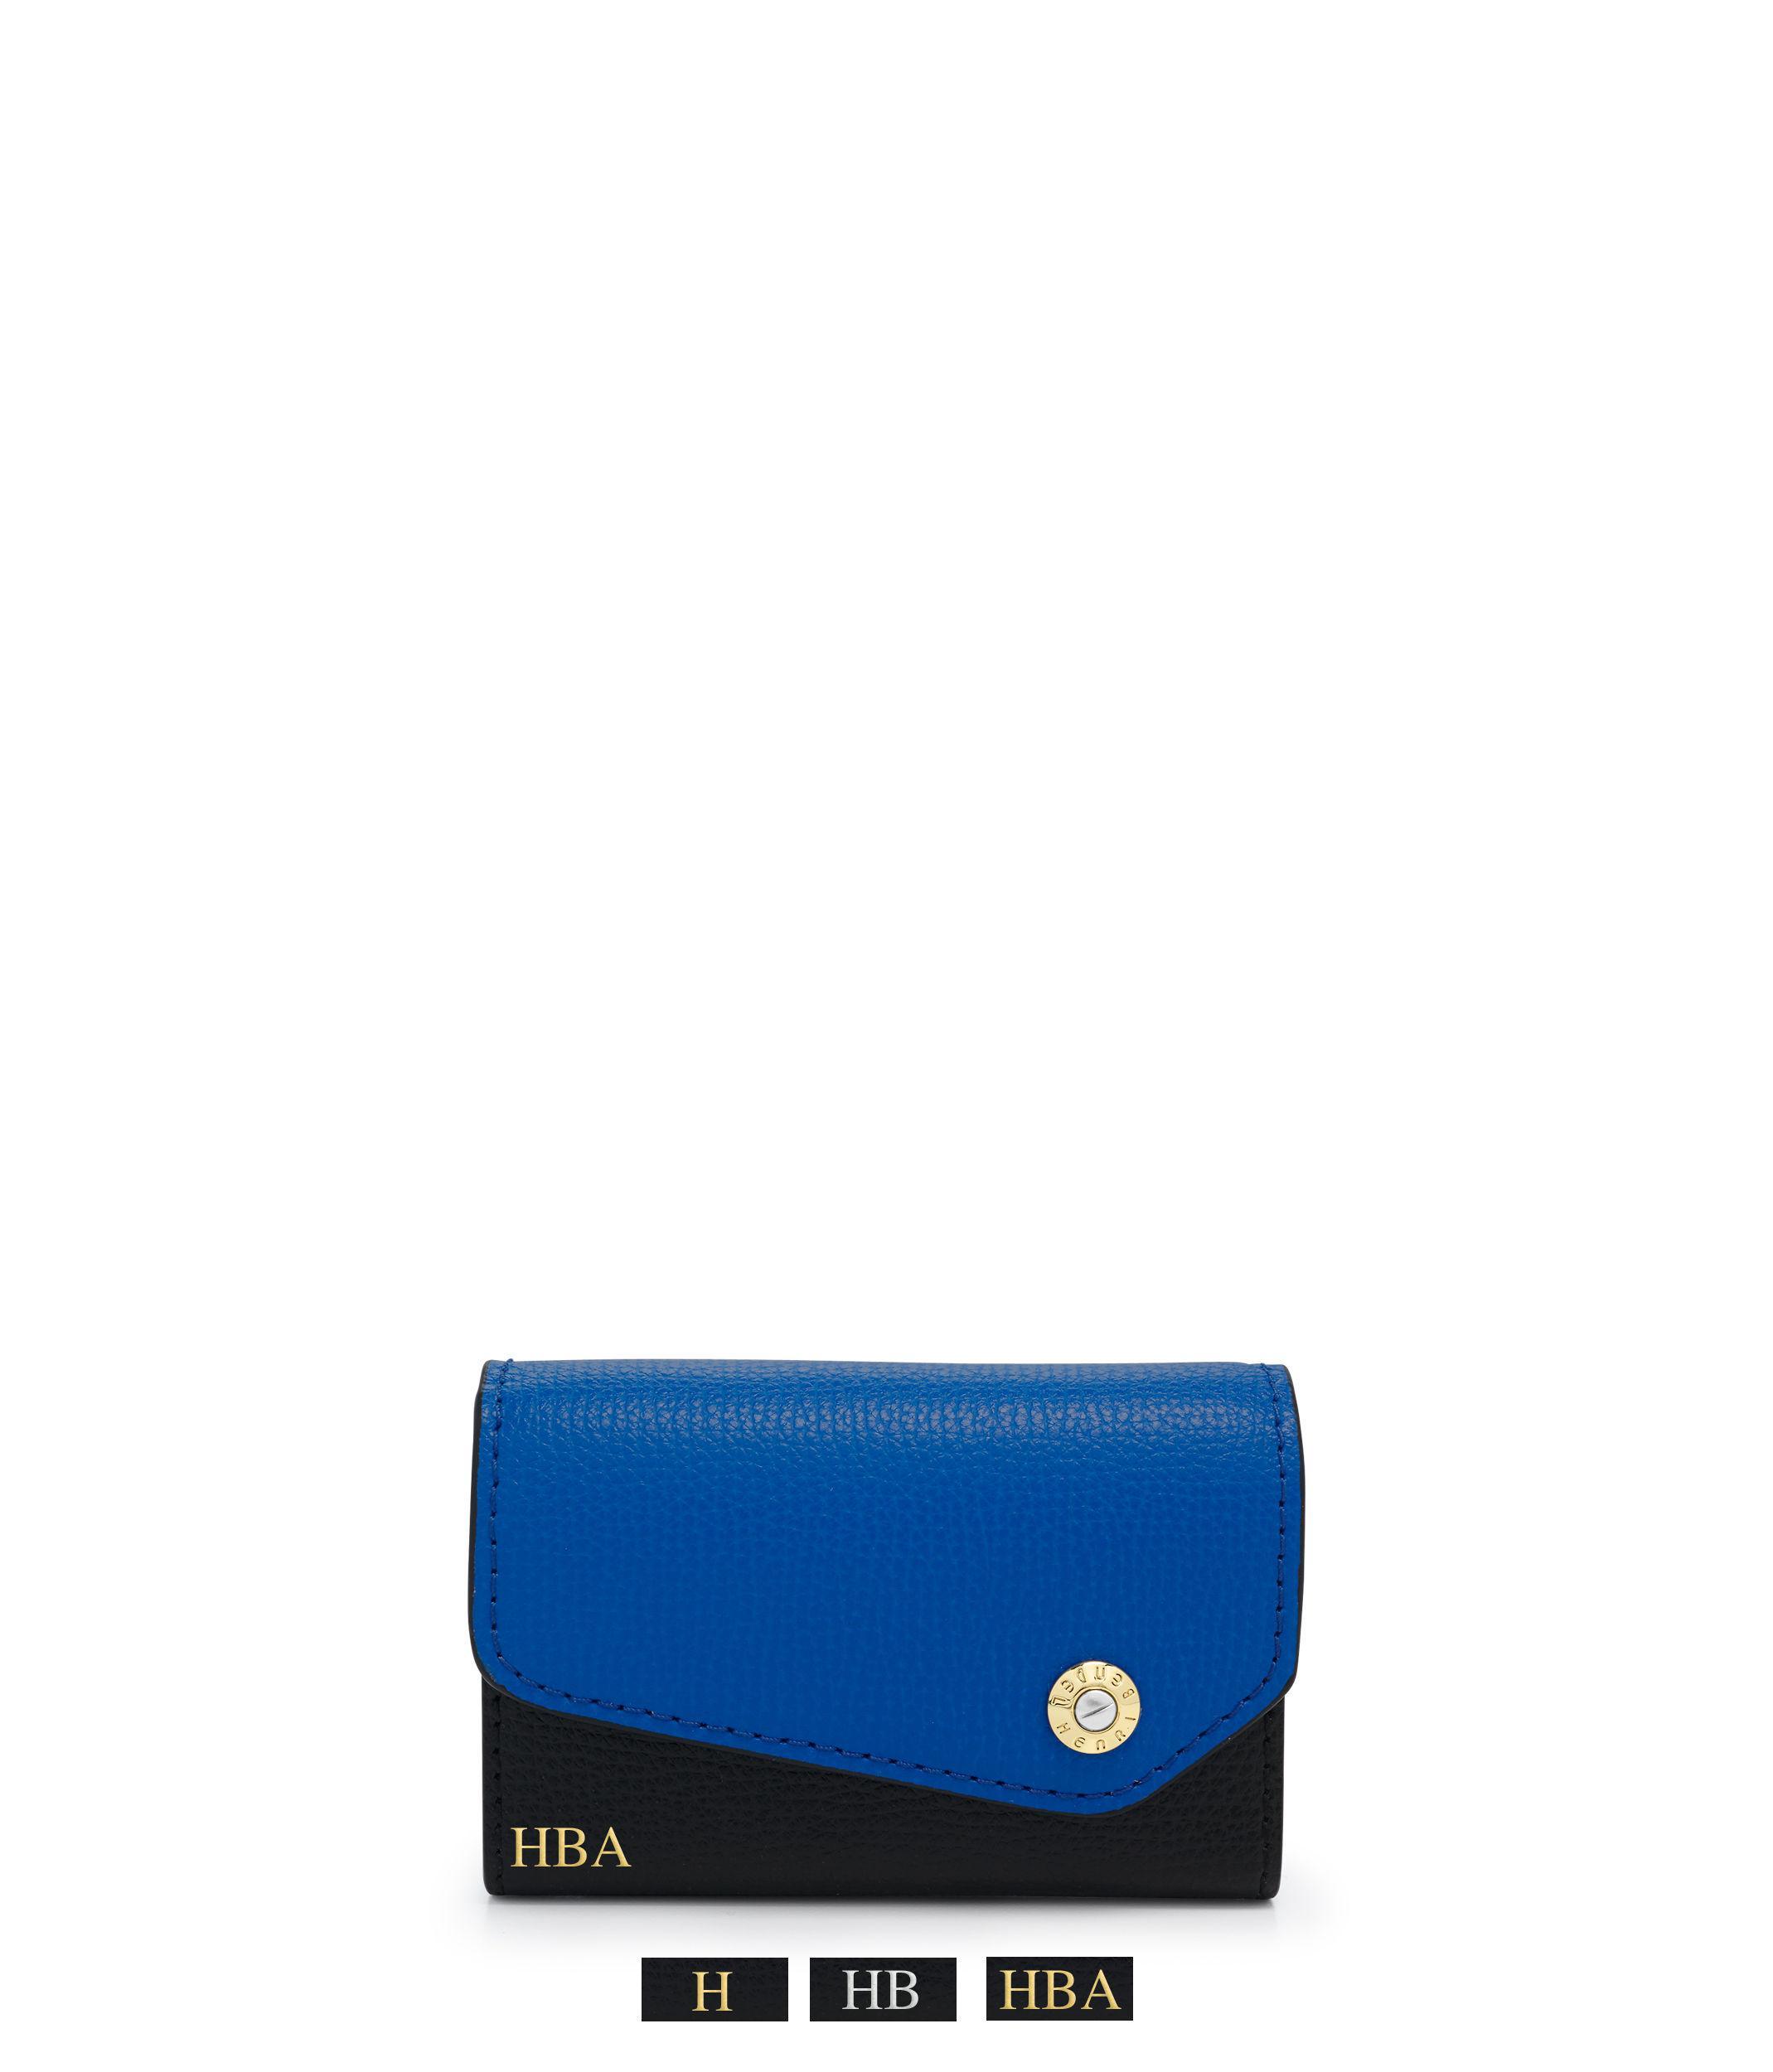 Lyst - Henri Bendel West 57th Color Blocked Business Card Case in Blue